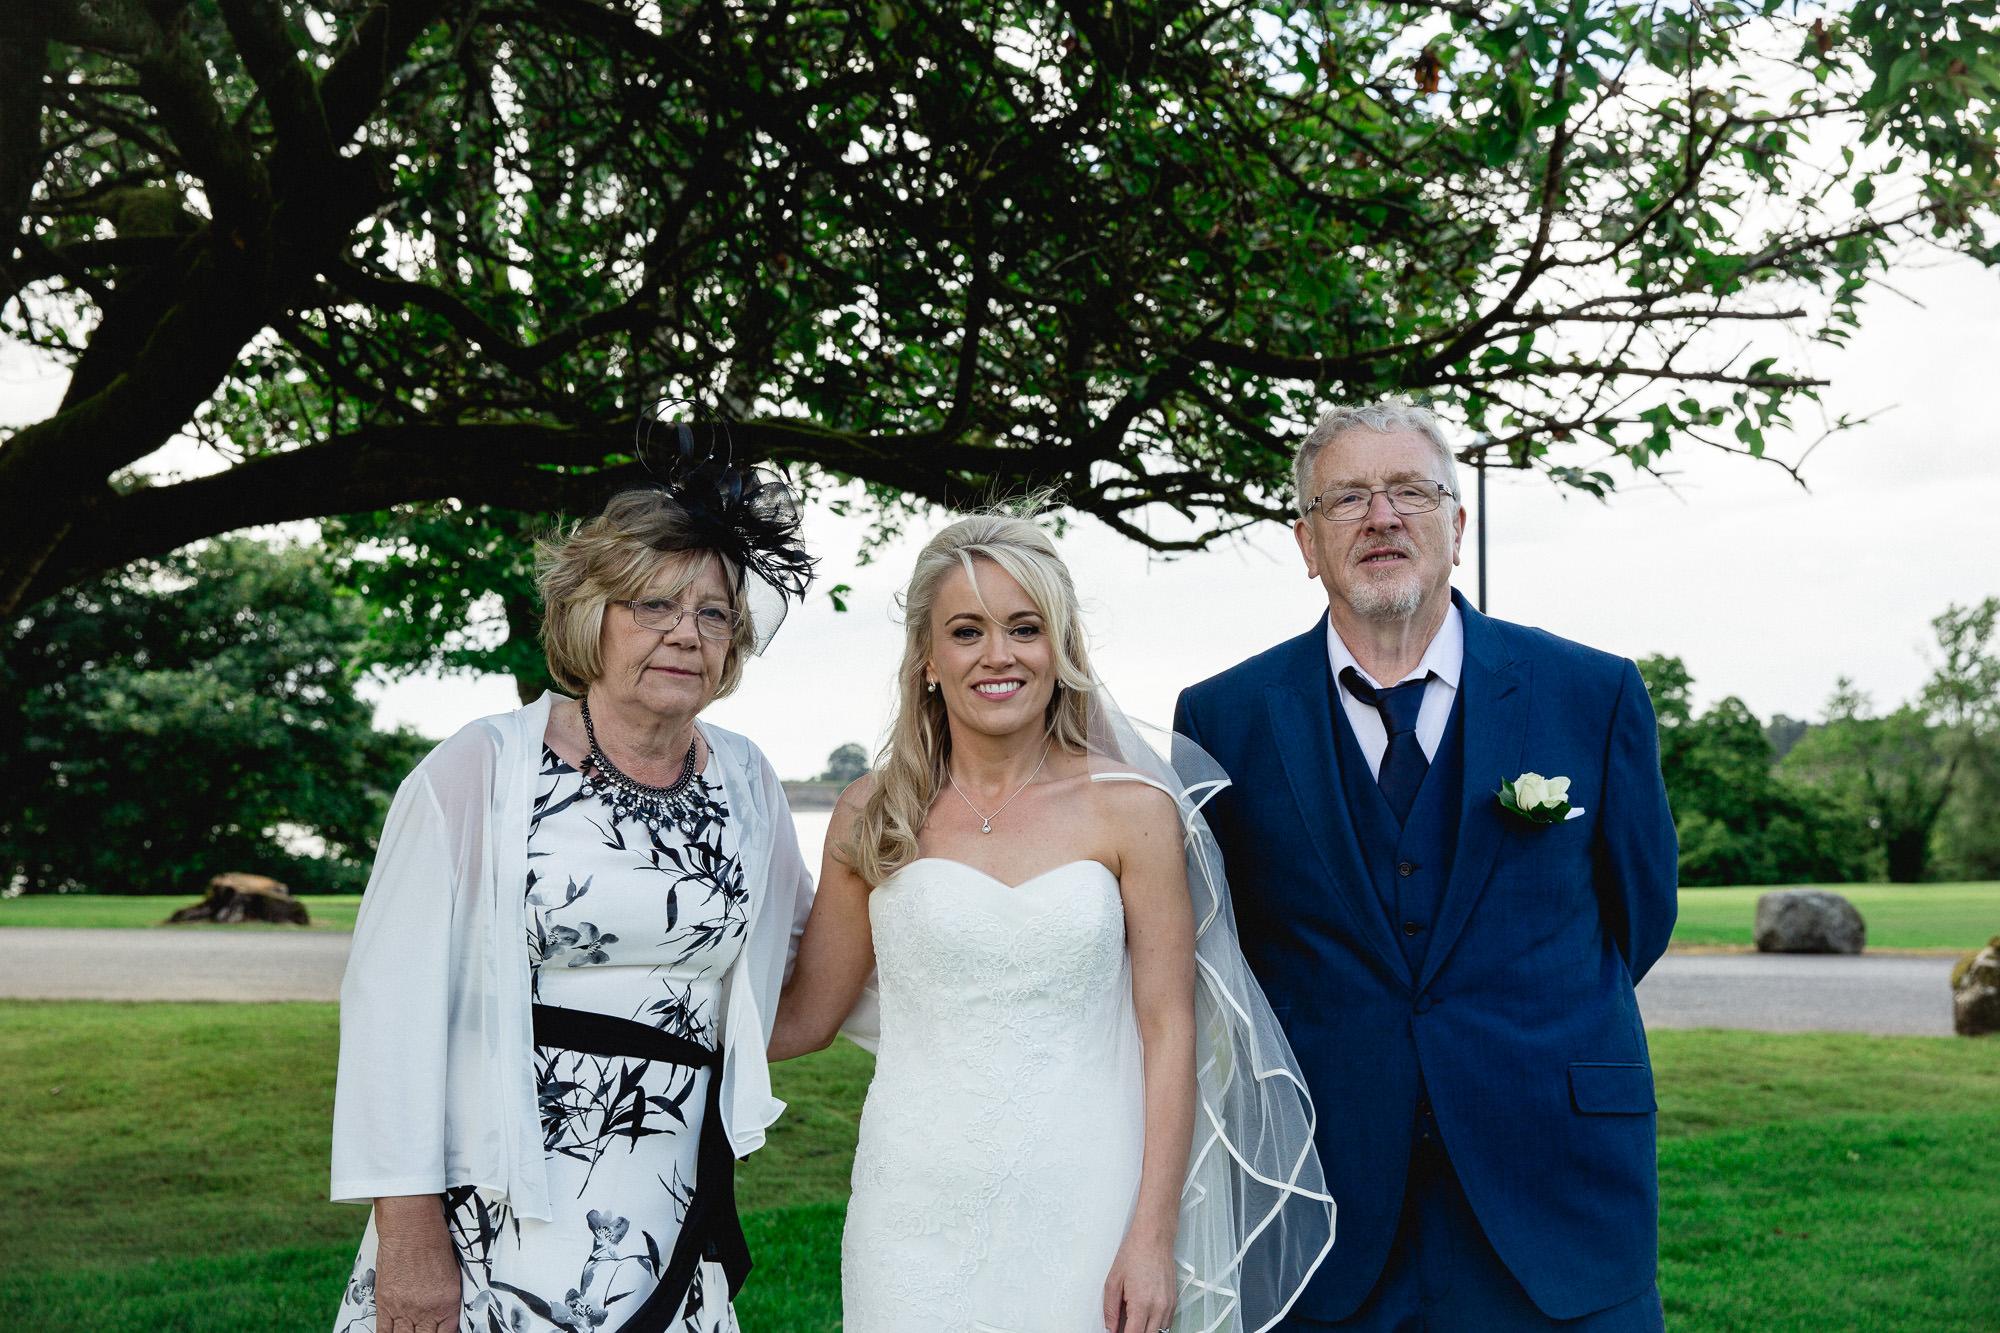 CLAIREBYRNEPHOTOGRAPHY-WEDDING-Ireland-tulffaris-alternative-fun-Lisa-terry-31.jpg